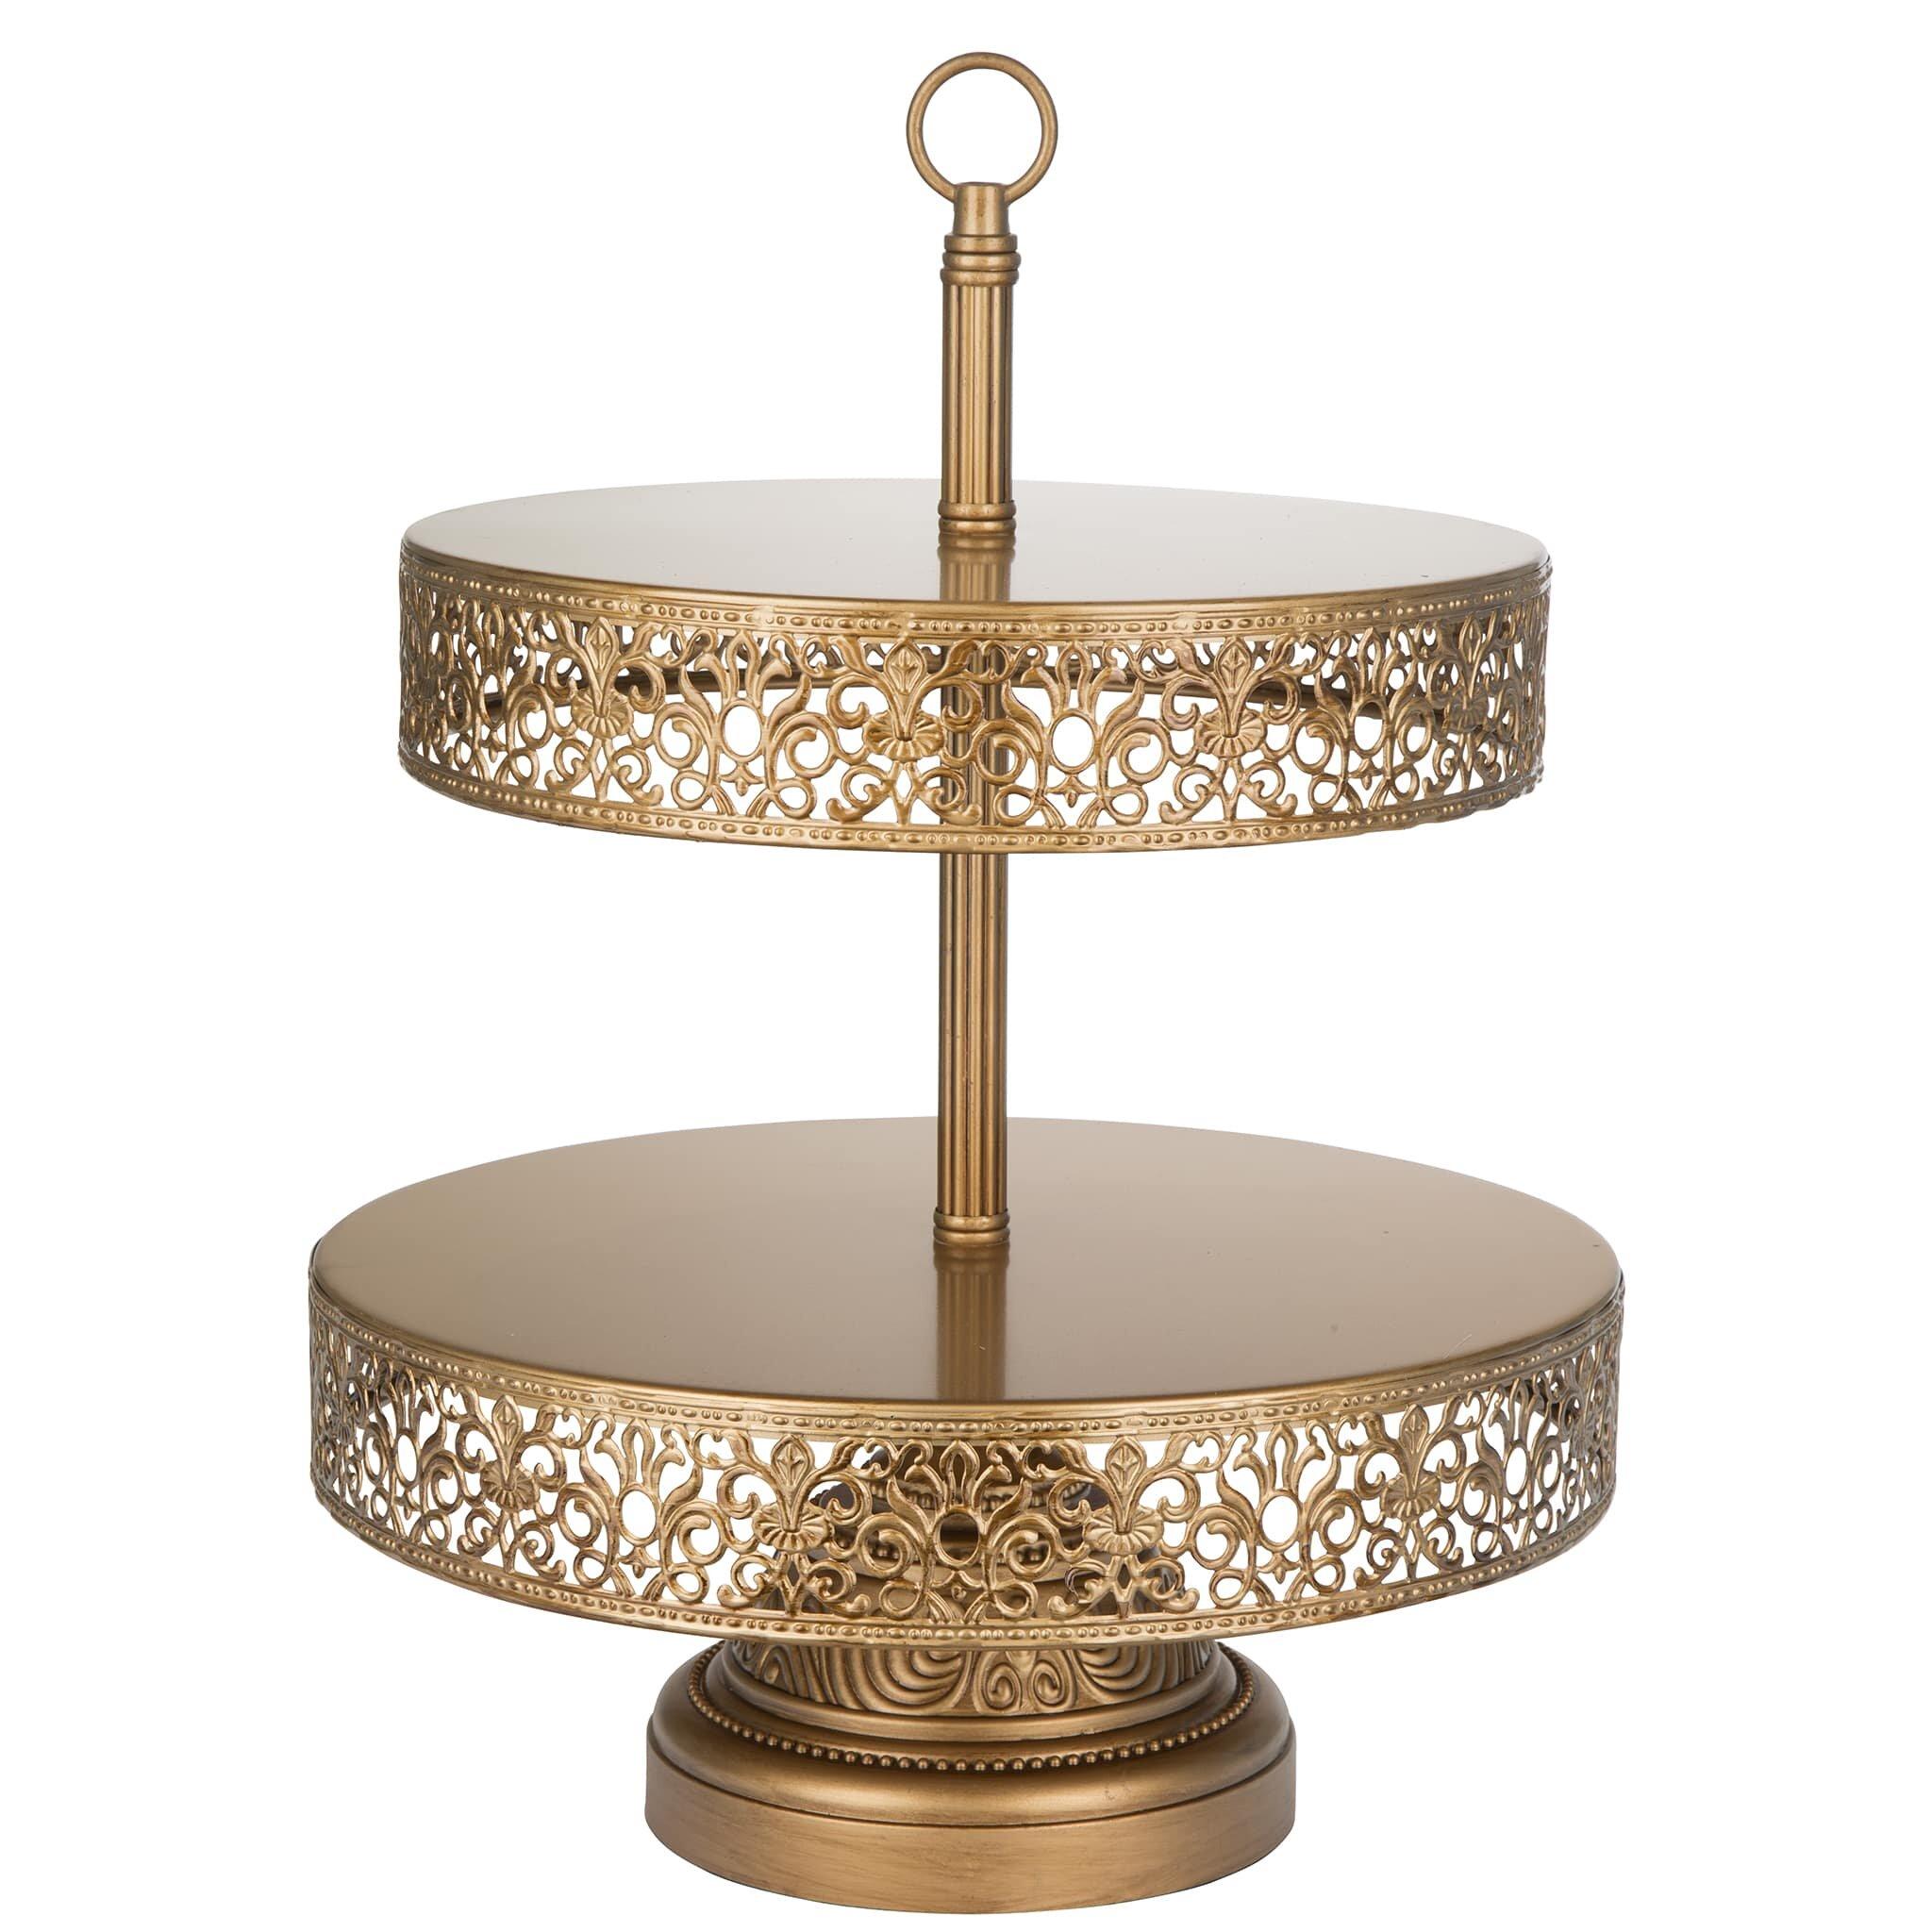 amalfidecor victoria 2 tier metal cupcake stand reviews. Black Bedroom Furniture Sets. Home Design Ideas